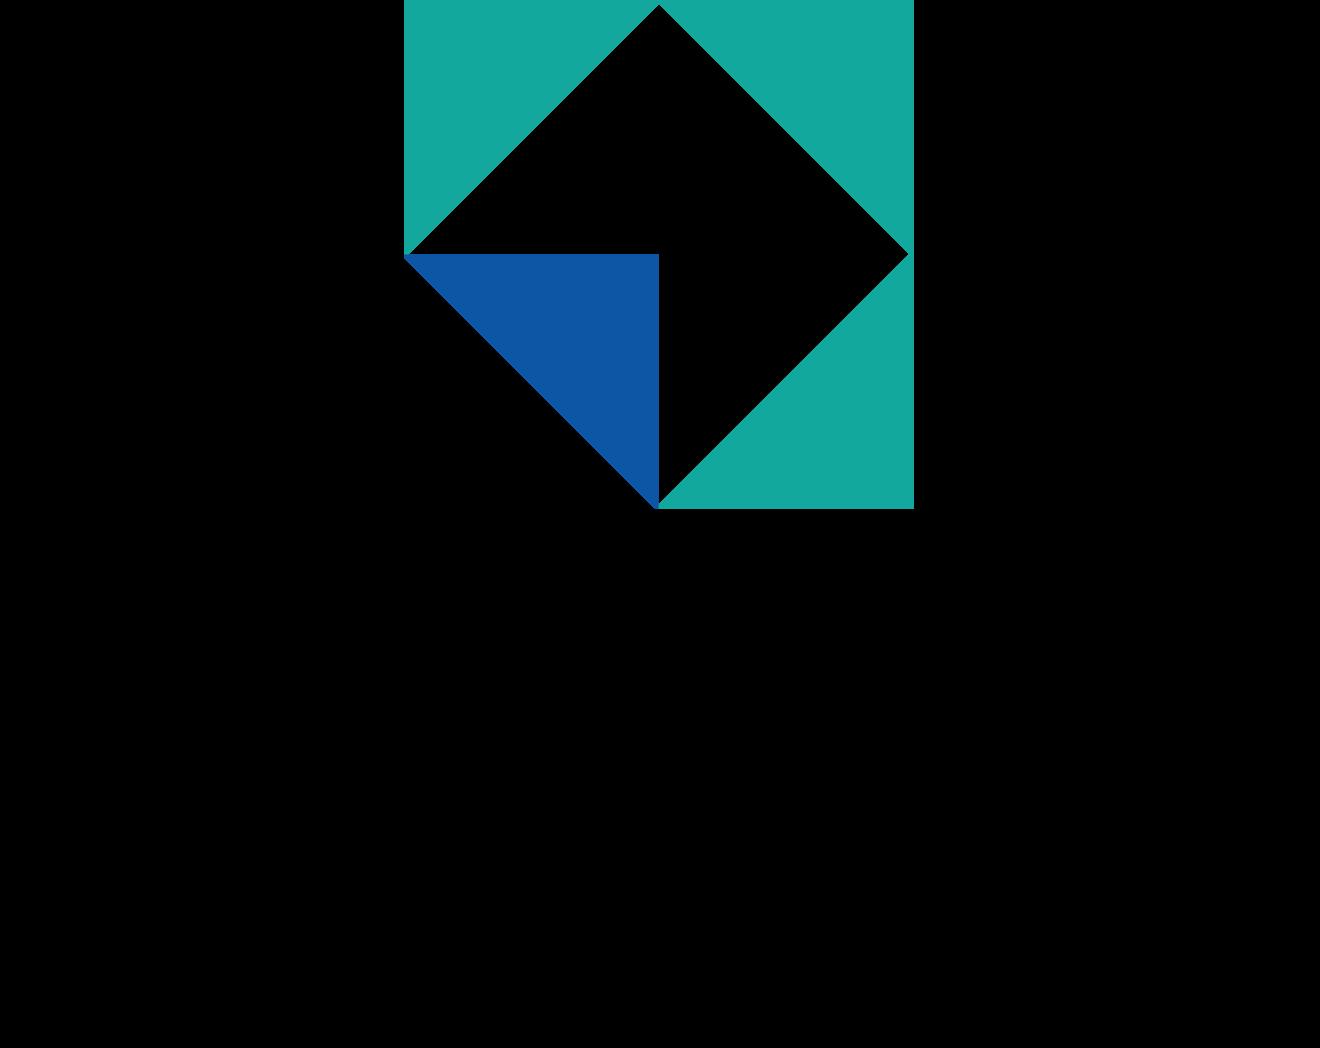 logo_ techlegic-notext.png - 27.69 Kb